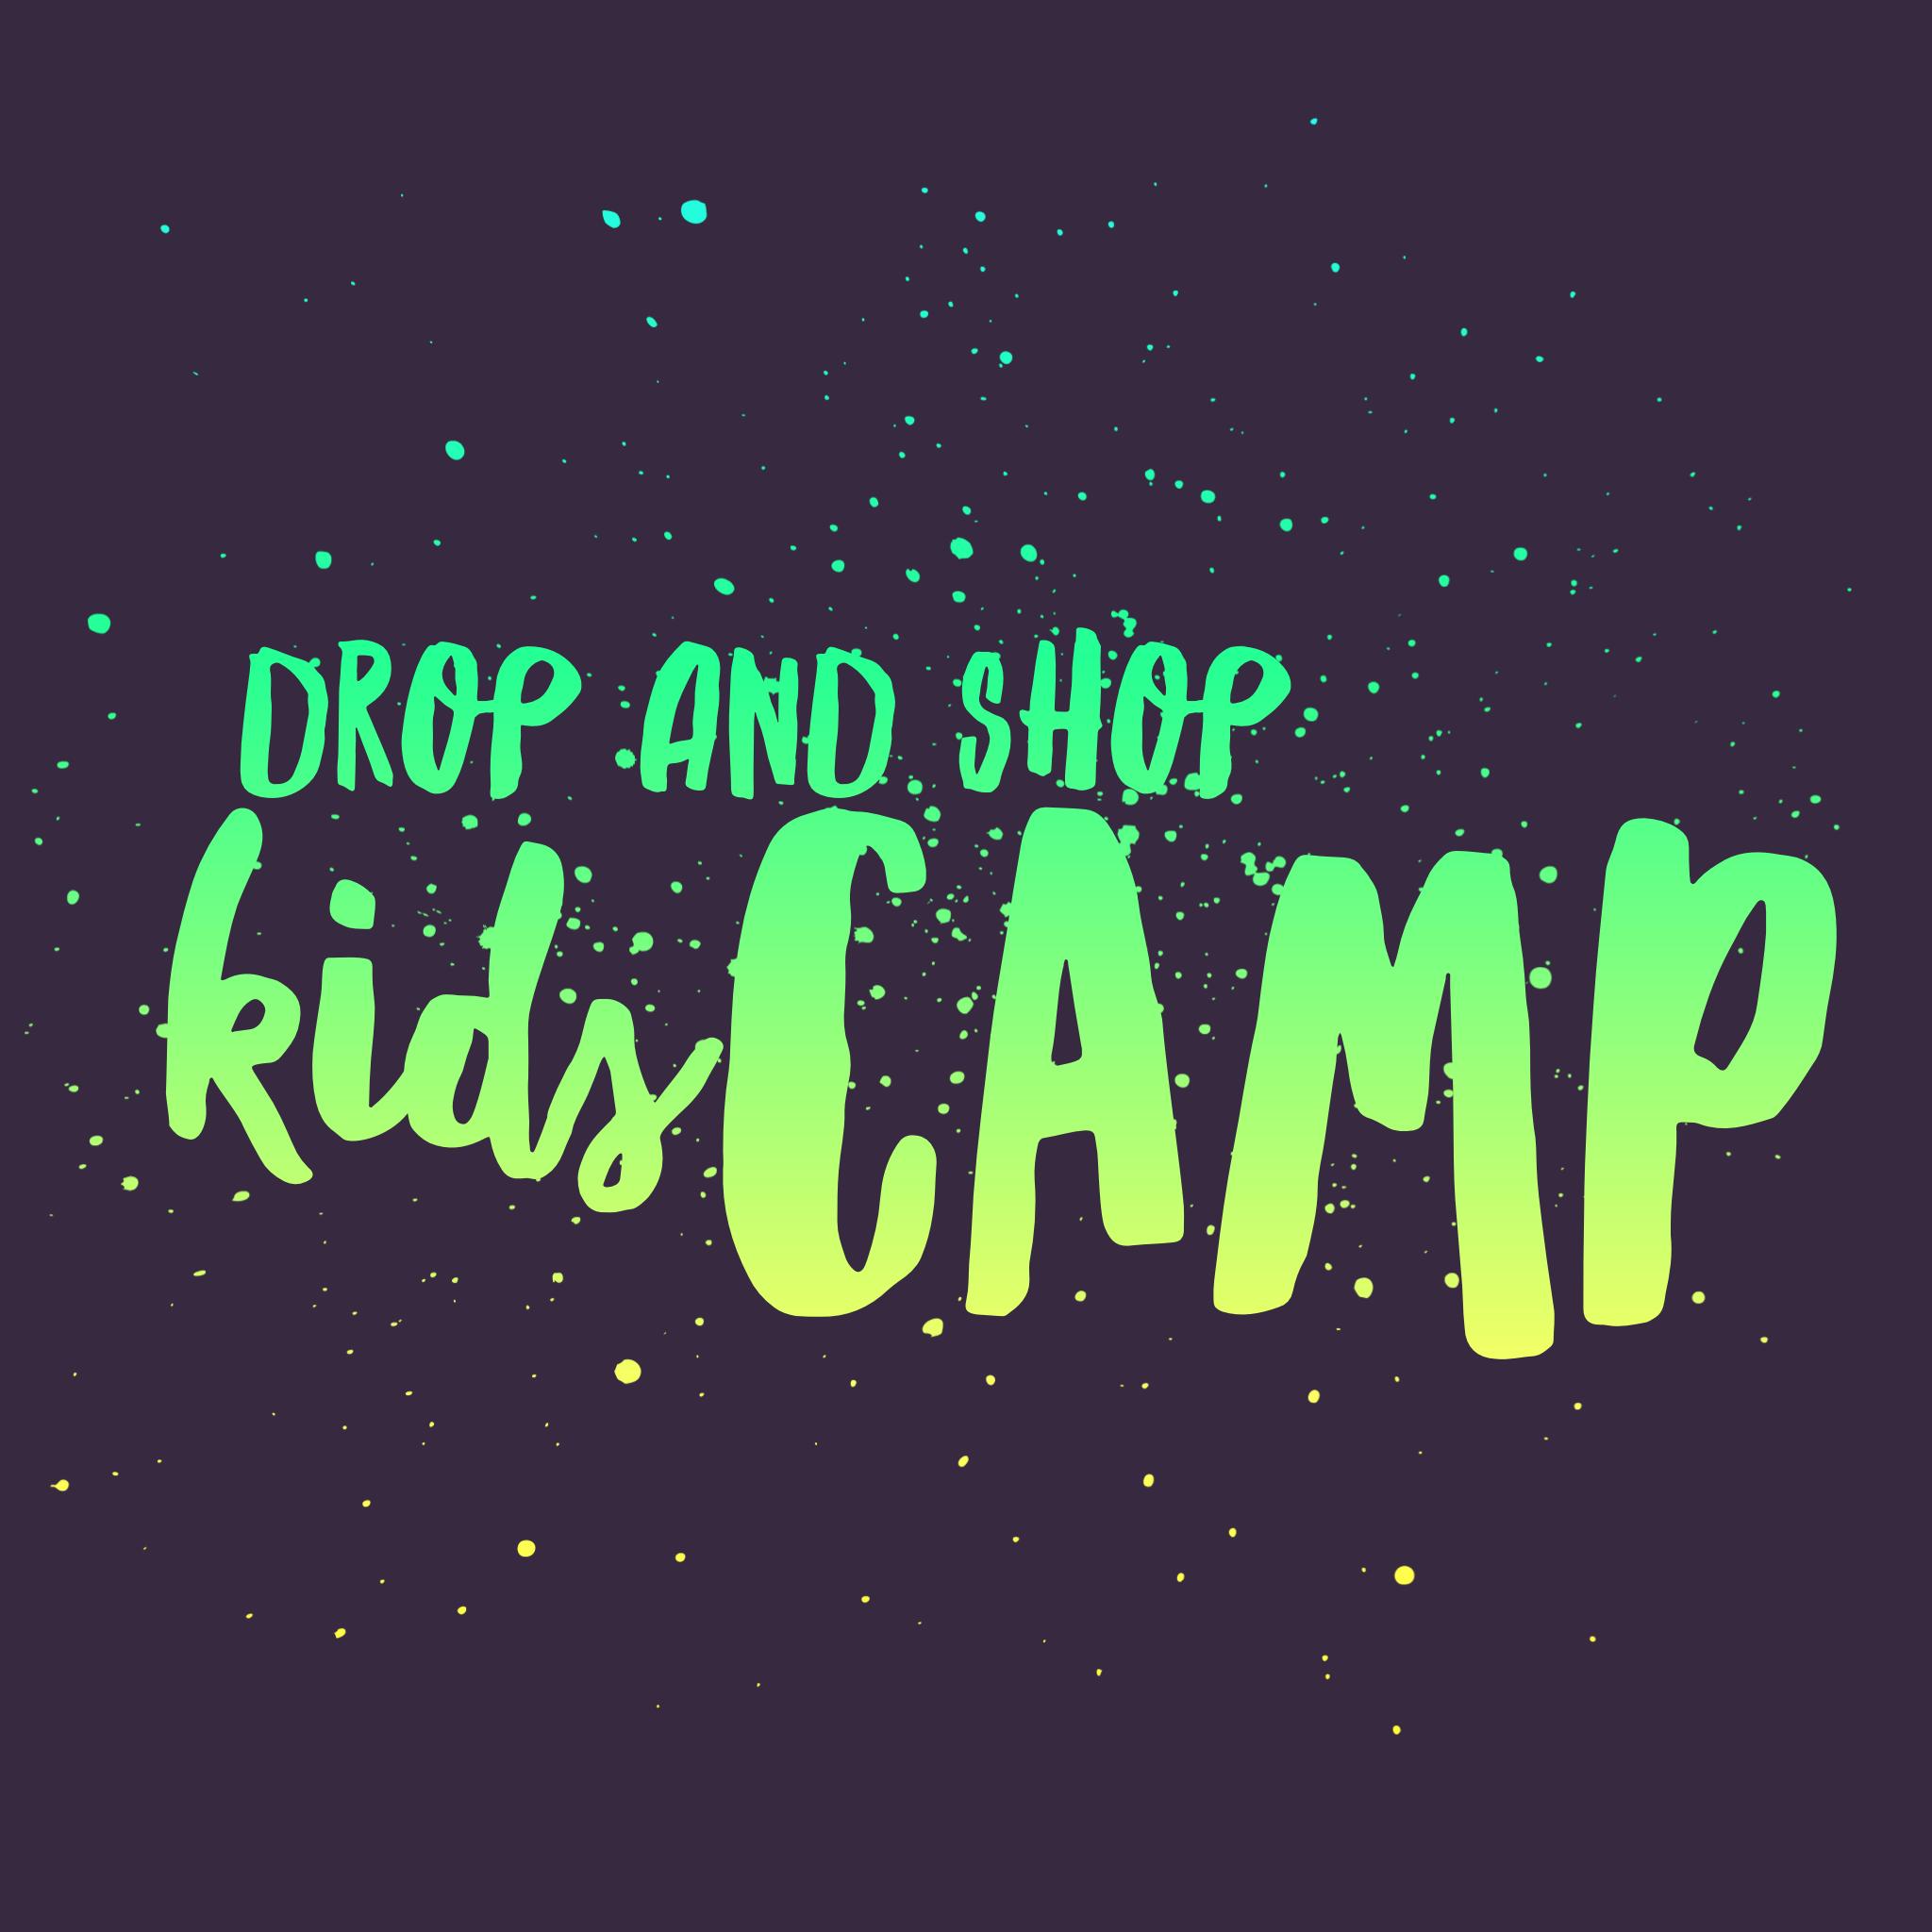 Drop & Shop Kids Camp